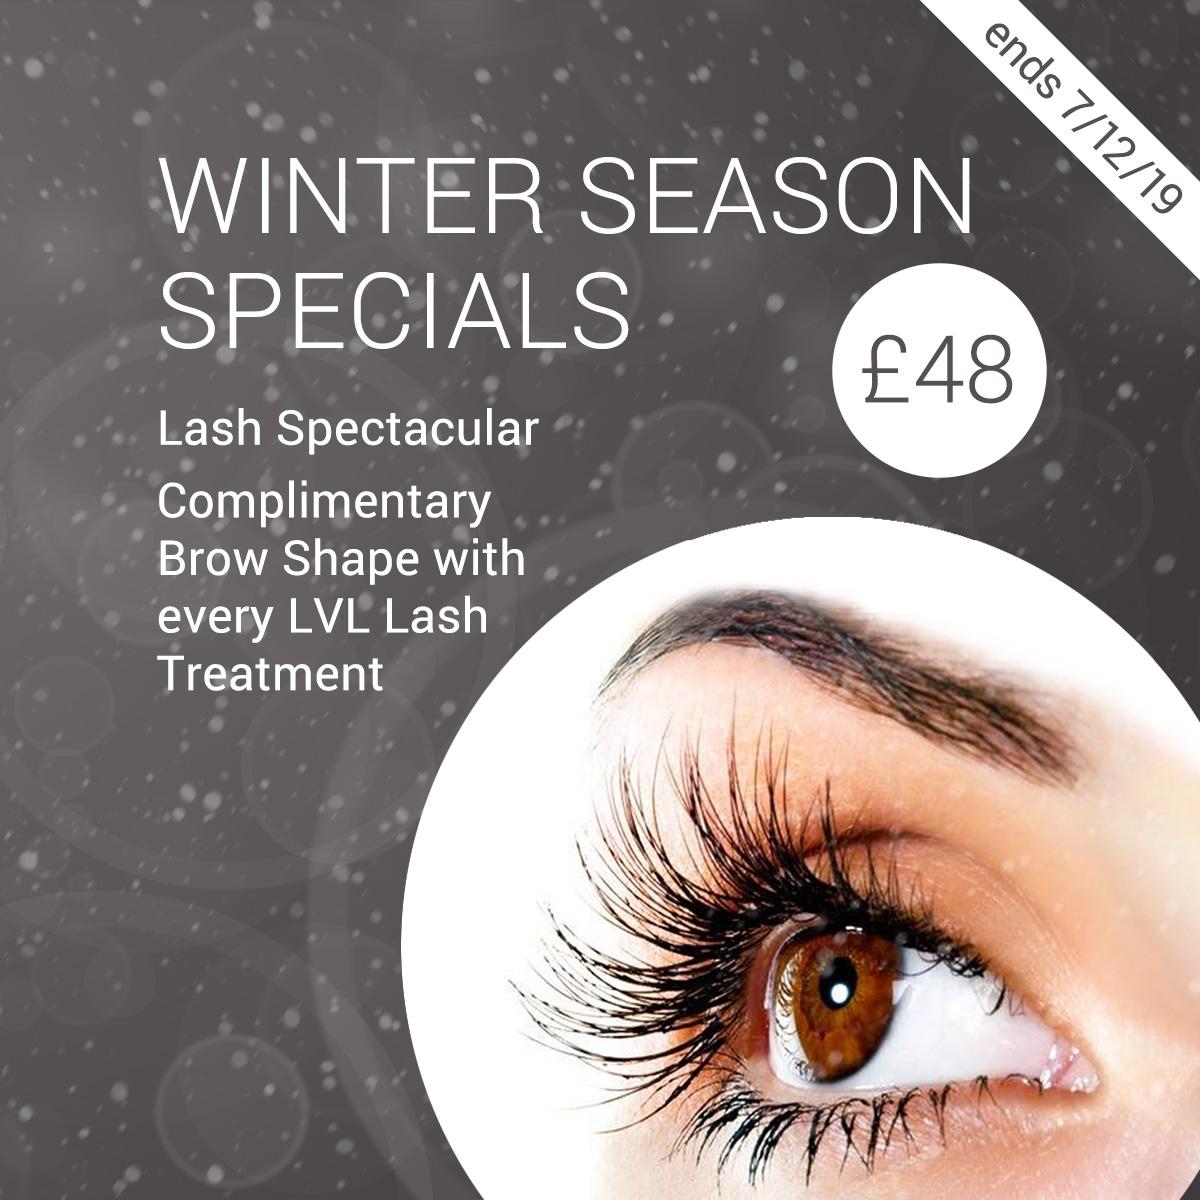 Winter-Specials-2019_1200x1200px